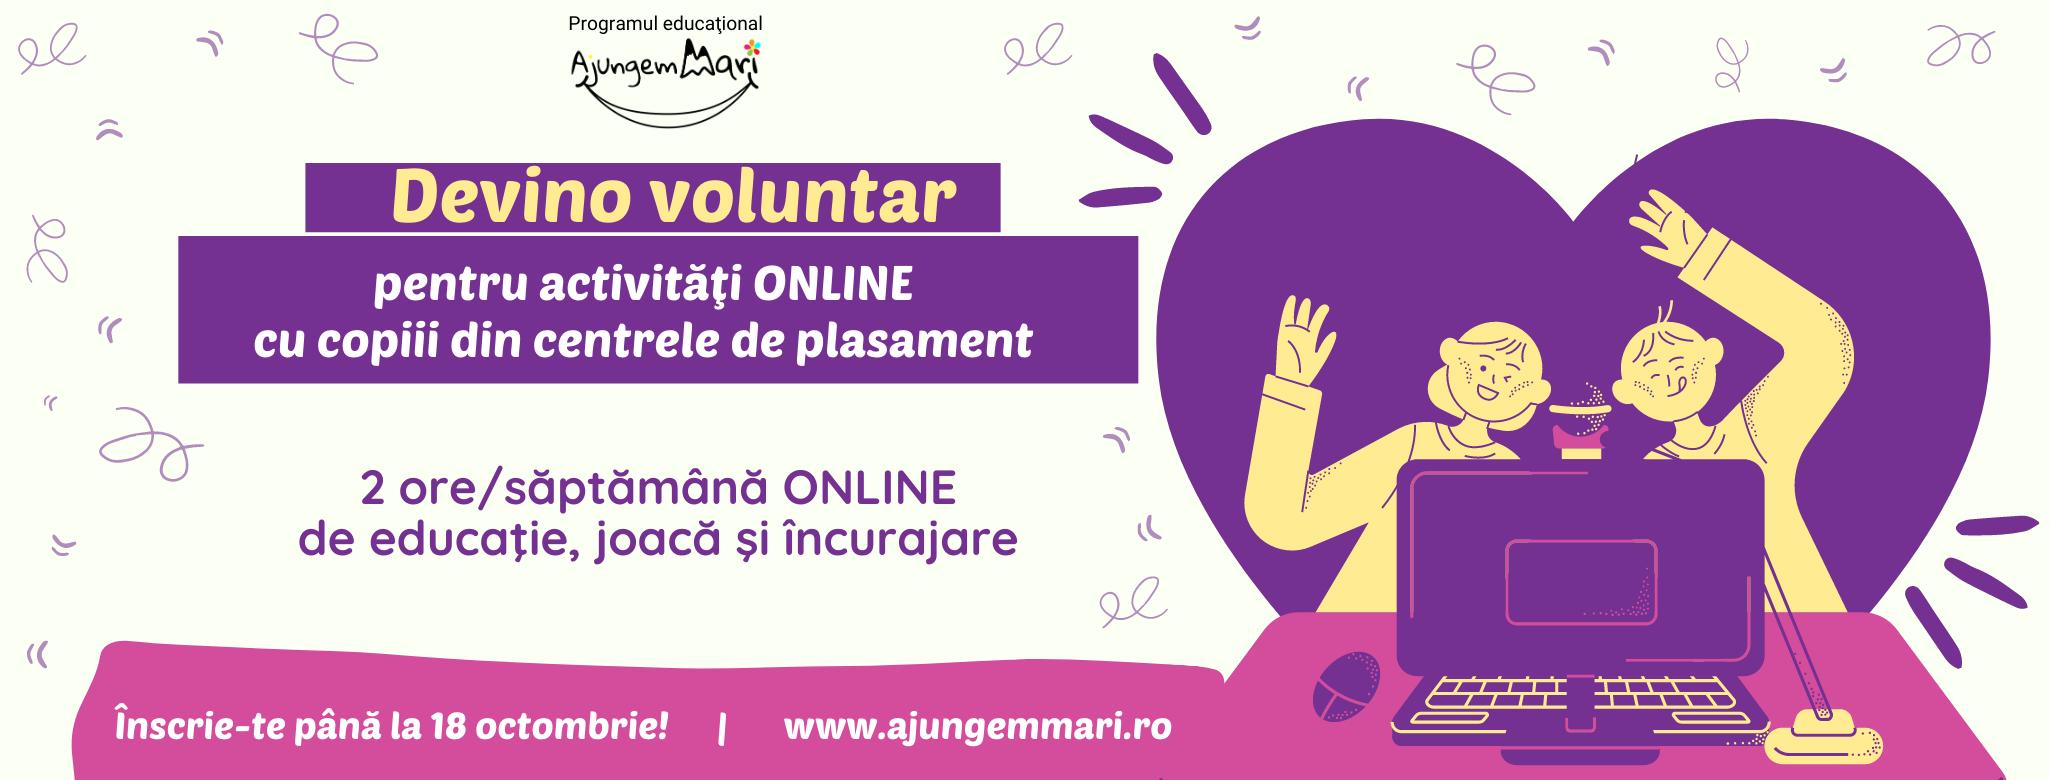 Cover-Devino-voluntar-ONLINE-prelungire